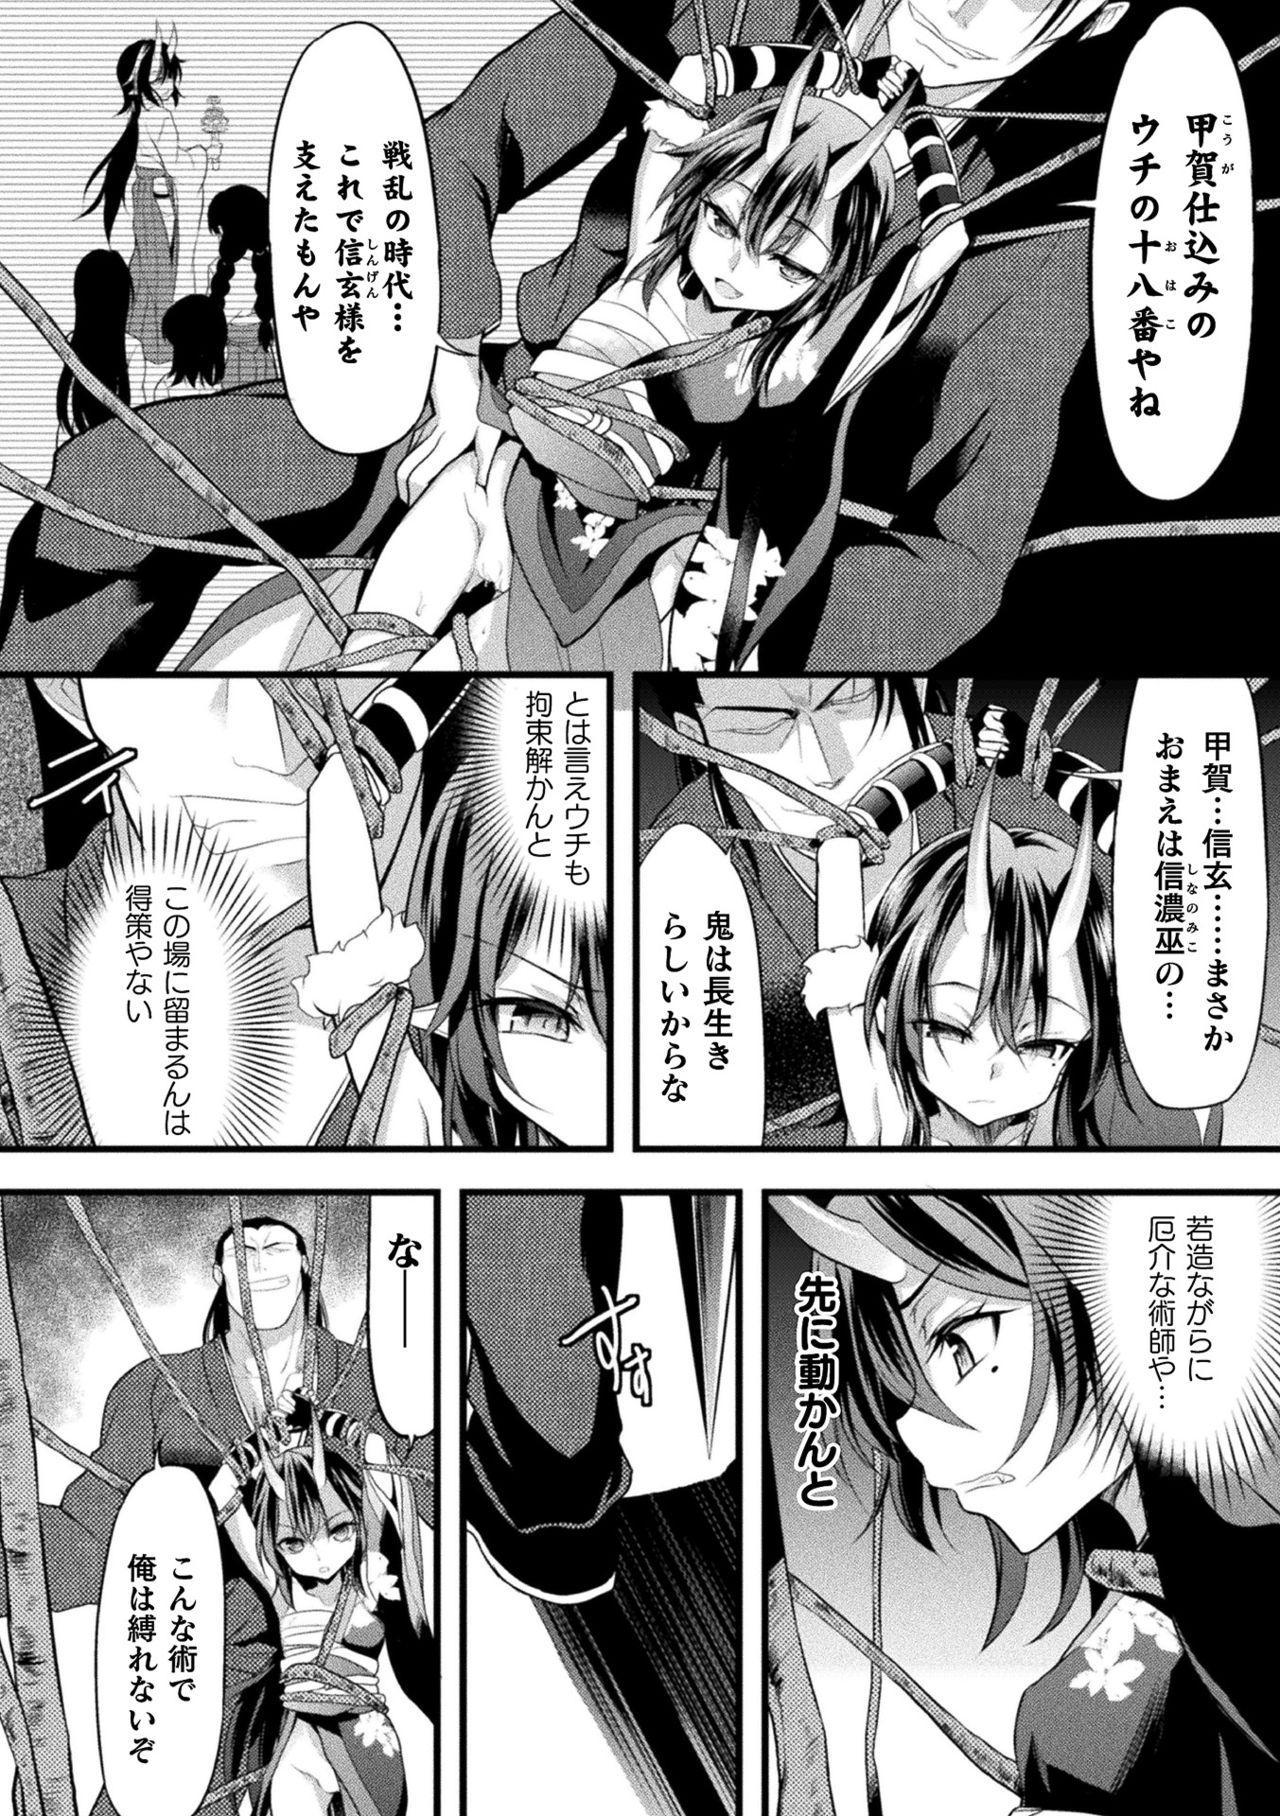 Loli-babaa Kyousei Tanetsuke Ecchi! Vol. 2 27